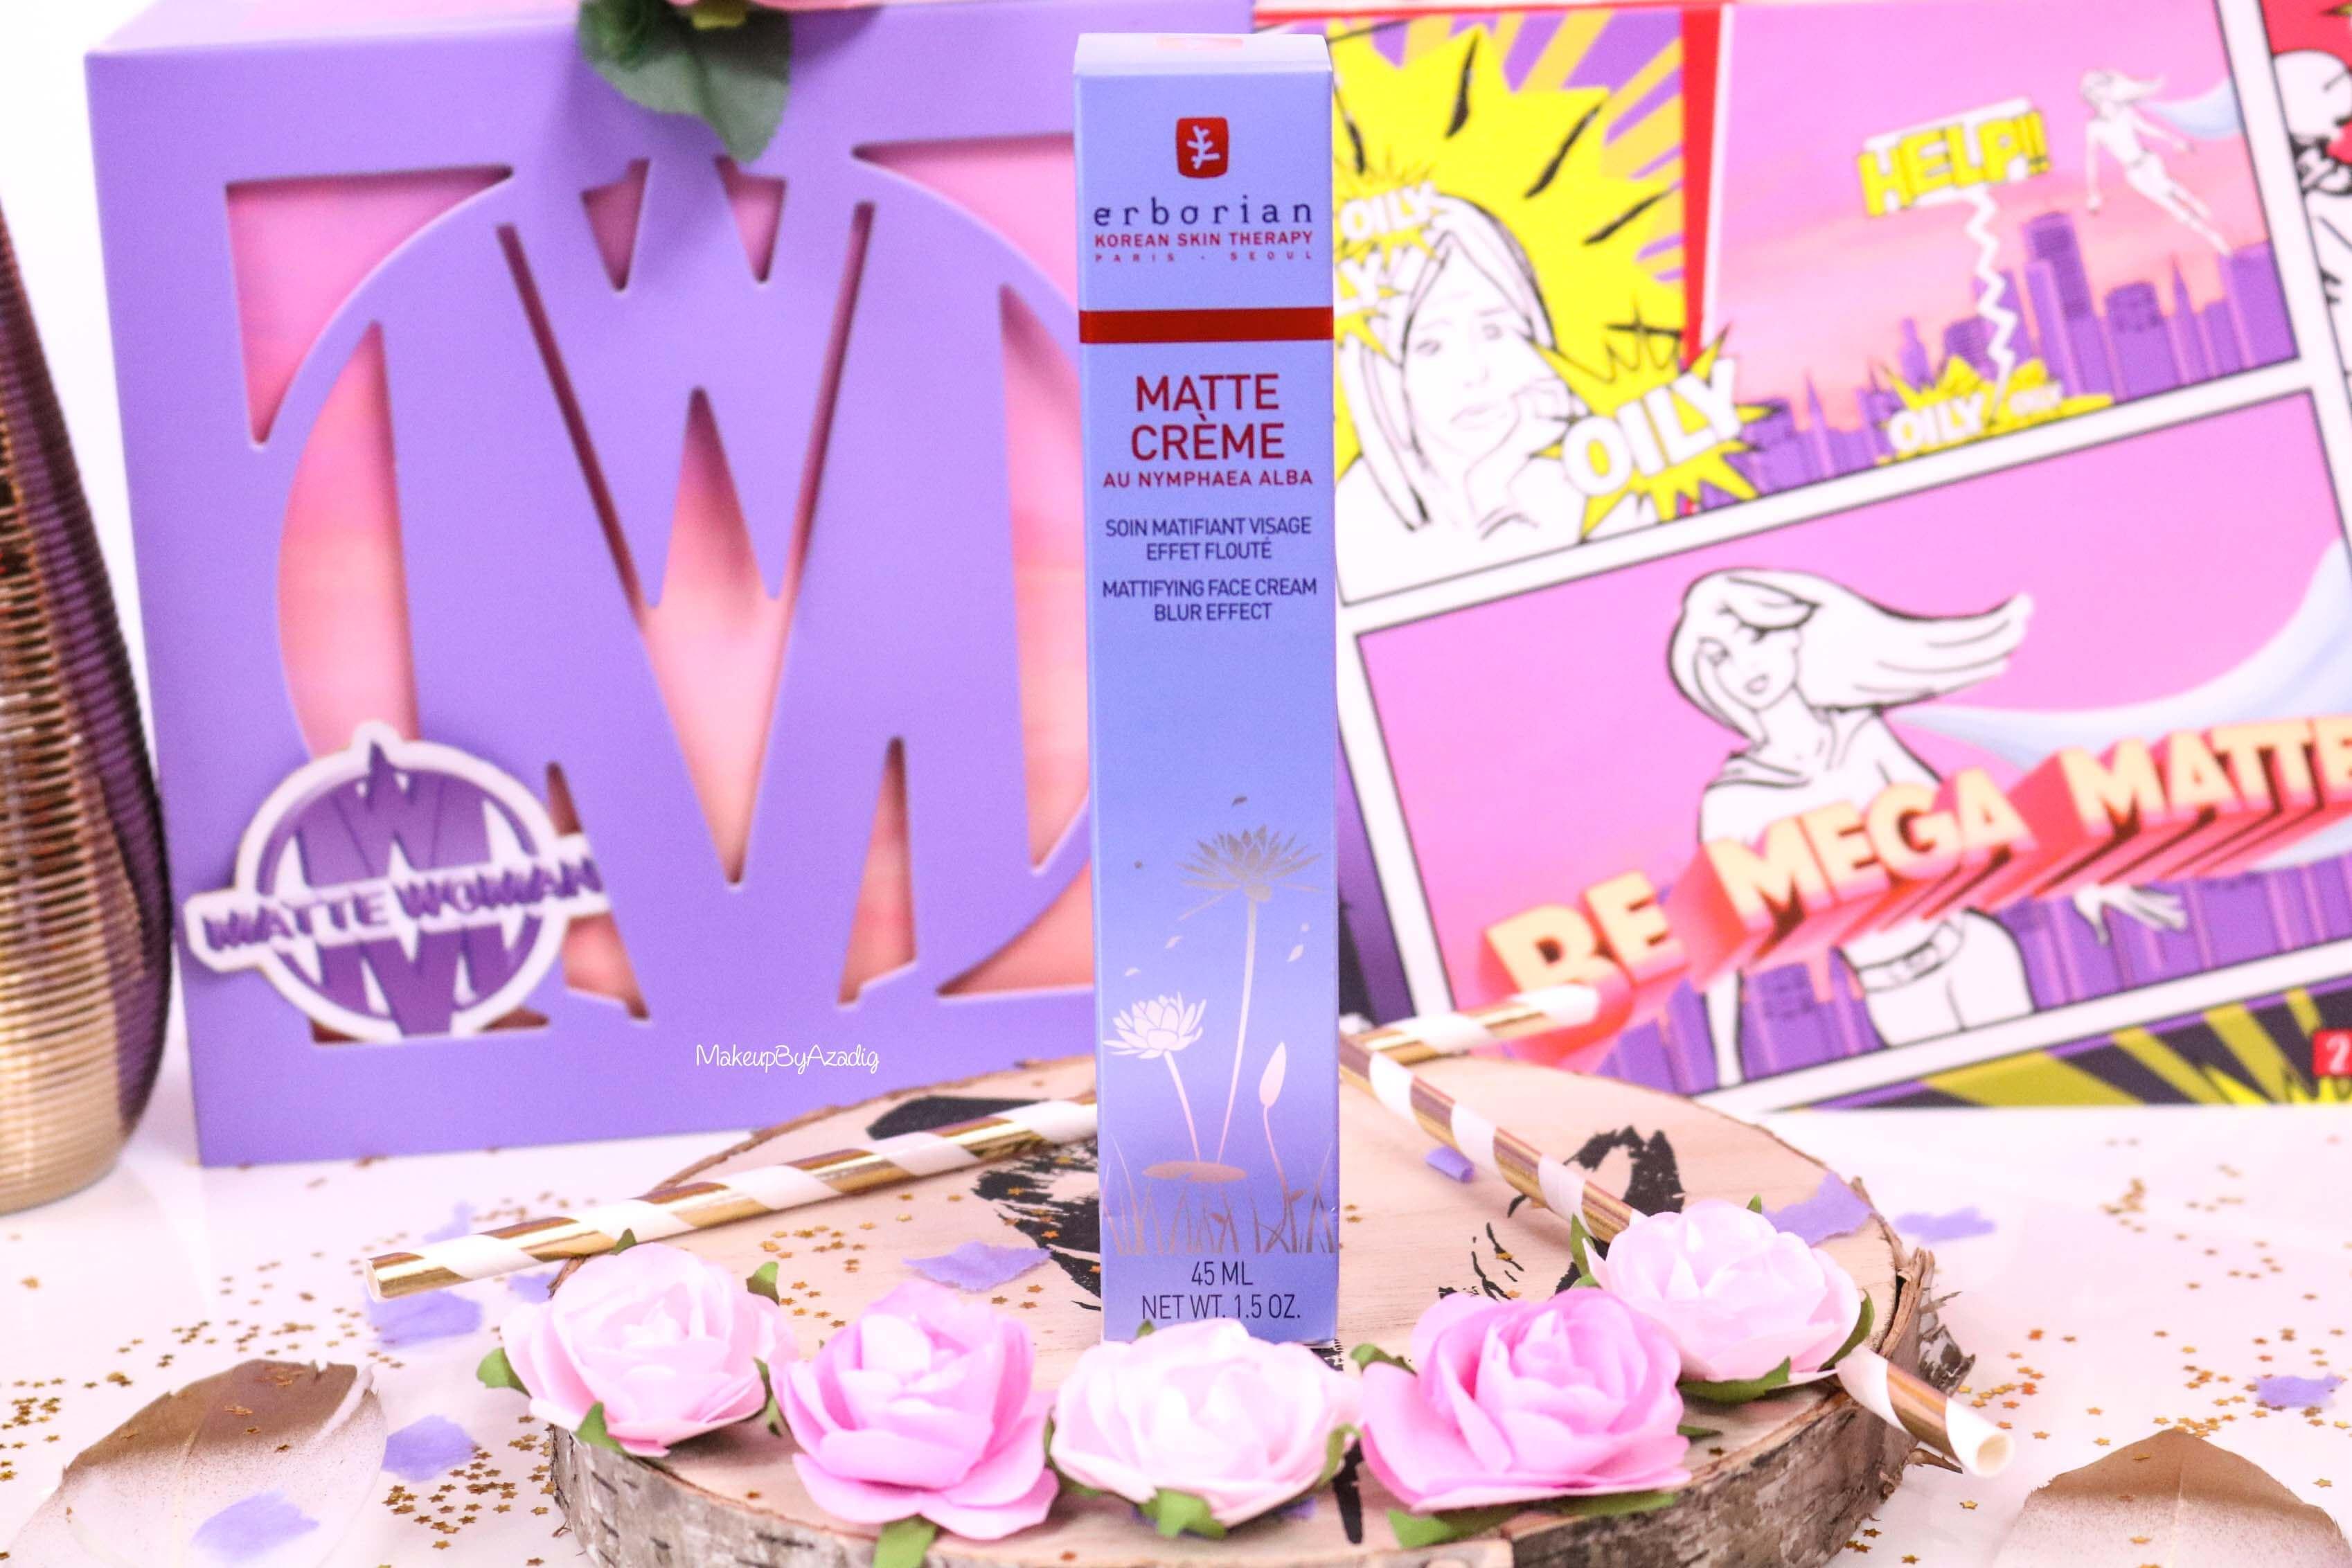 revue-matte-creme-matifiant-floute-erborian-prix-avis-makeupbyazadig-nouveaute-sephora-korean